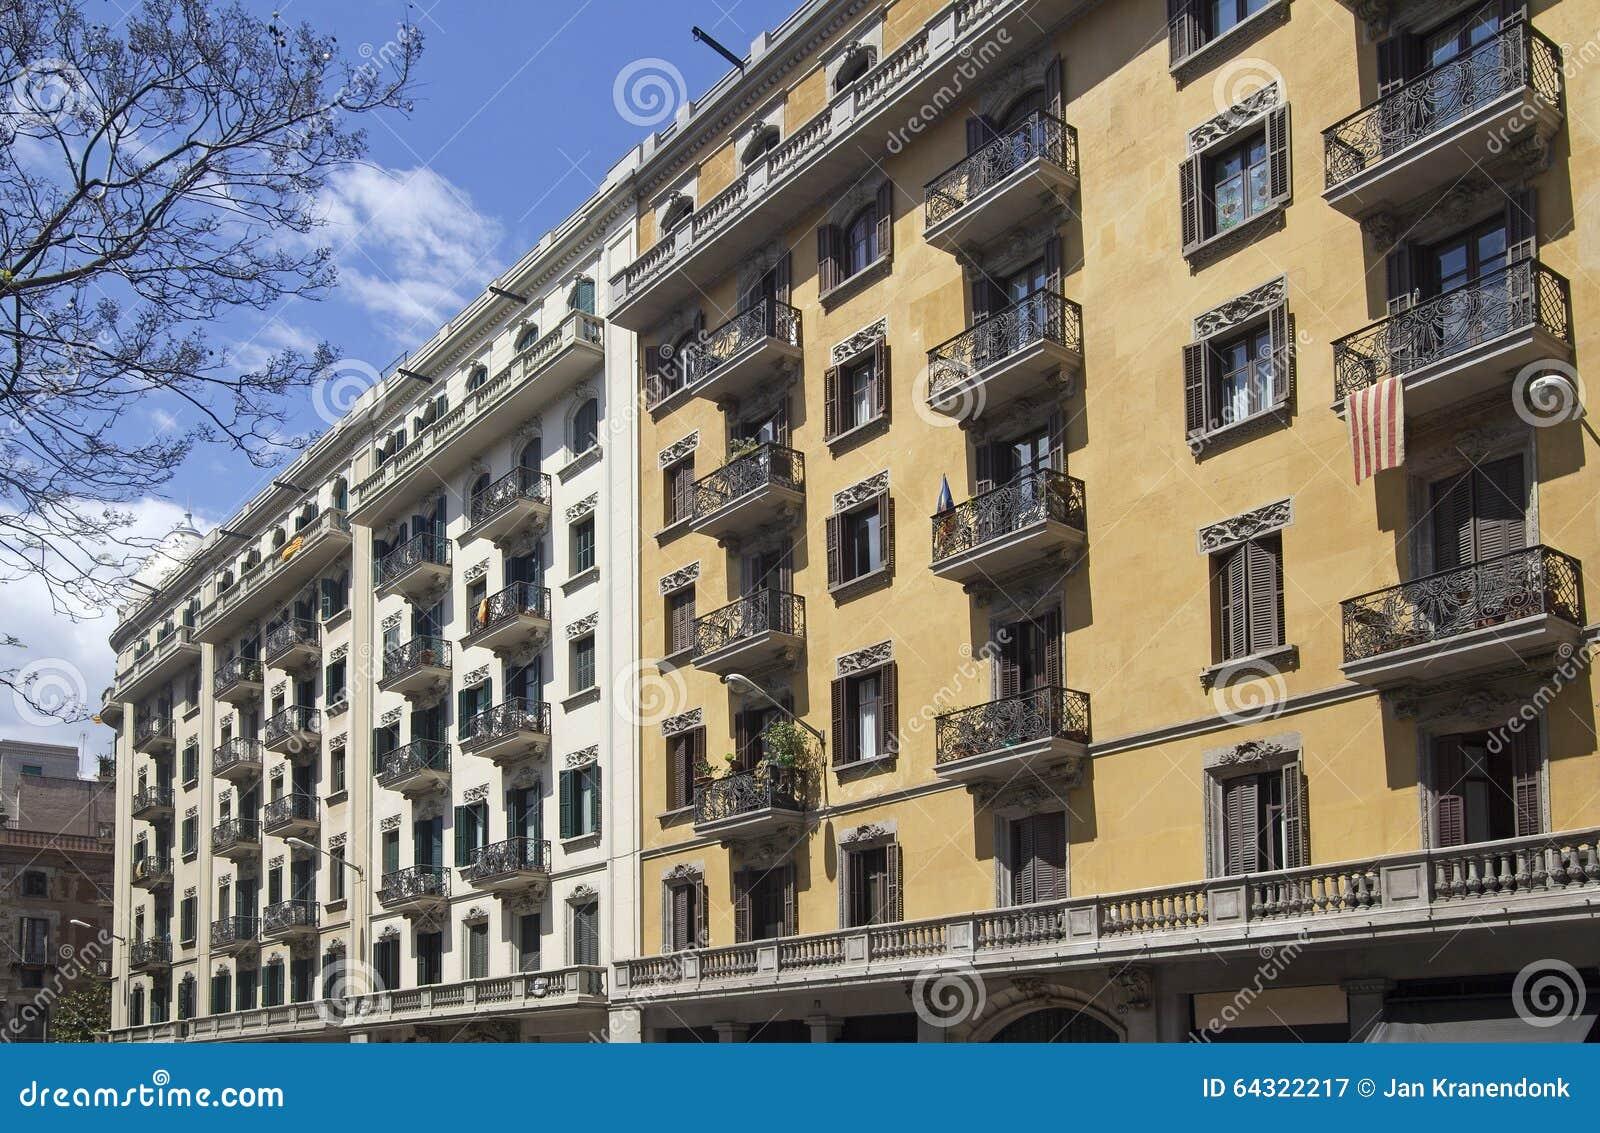 Apartment Buildings In Barcelona, Spain Stock Image ...